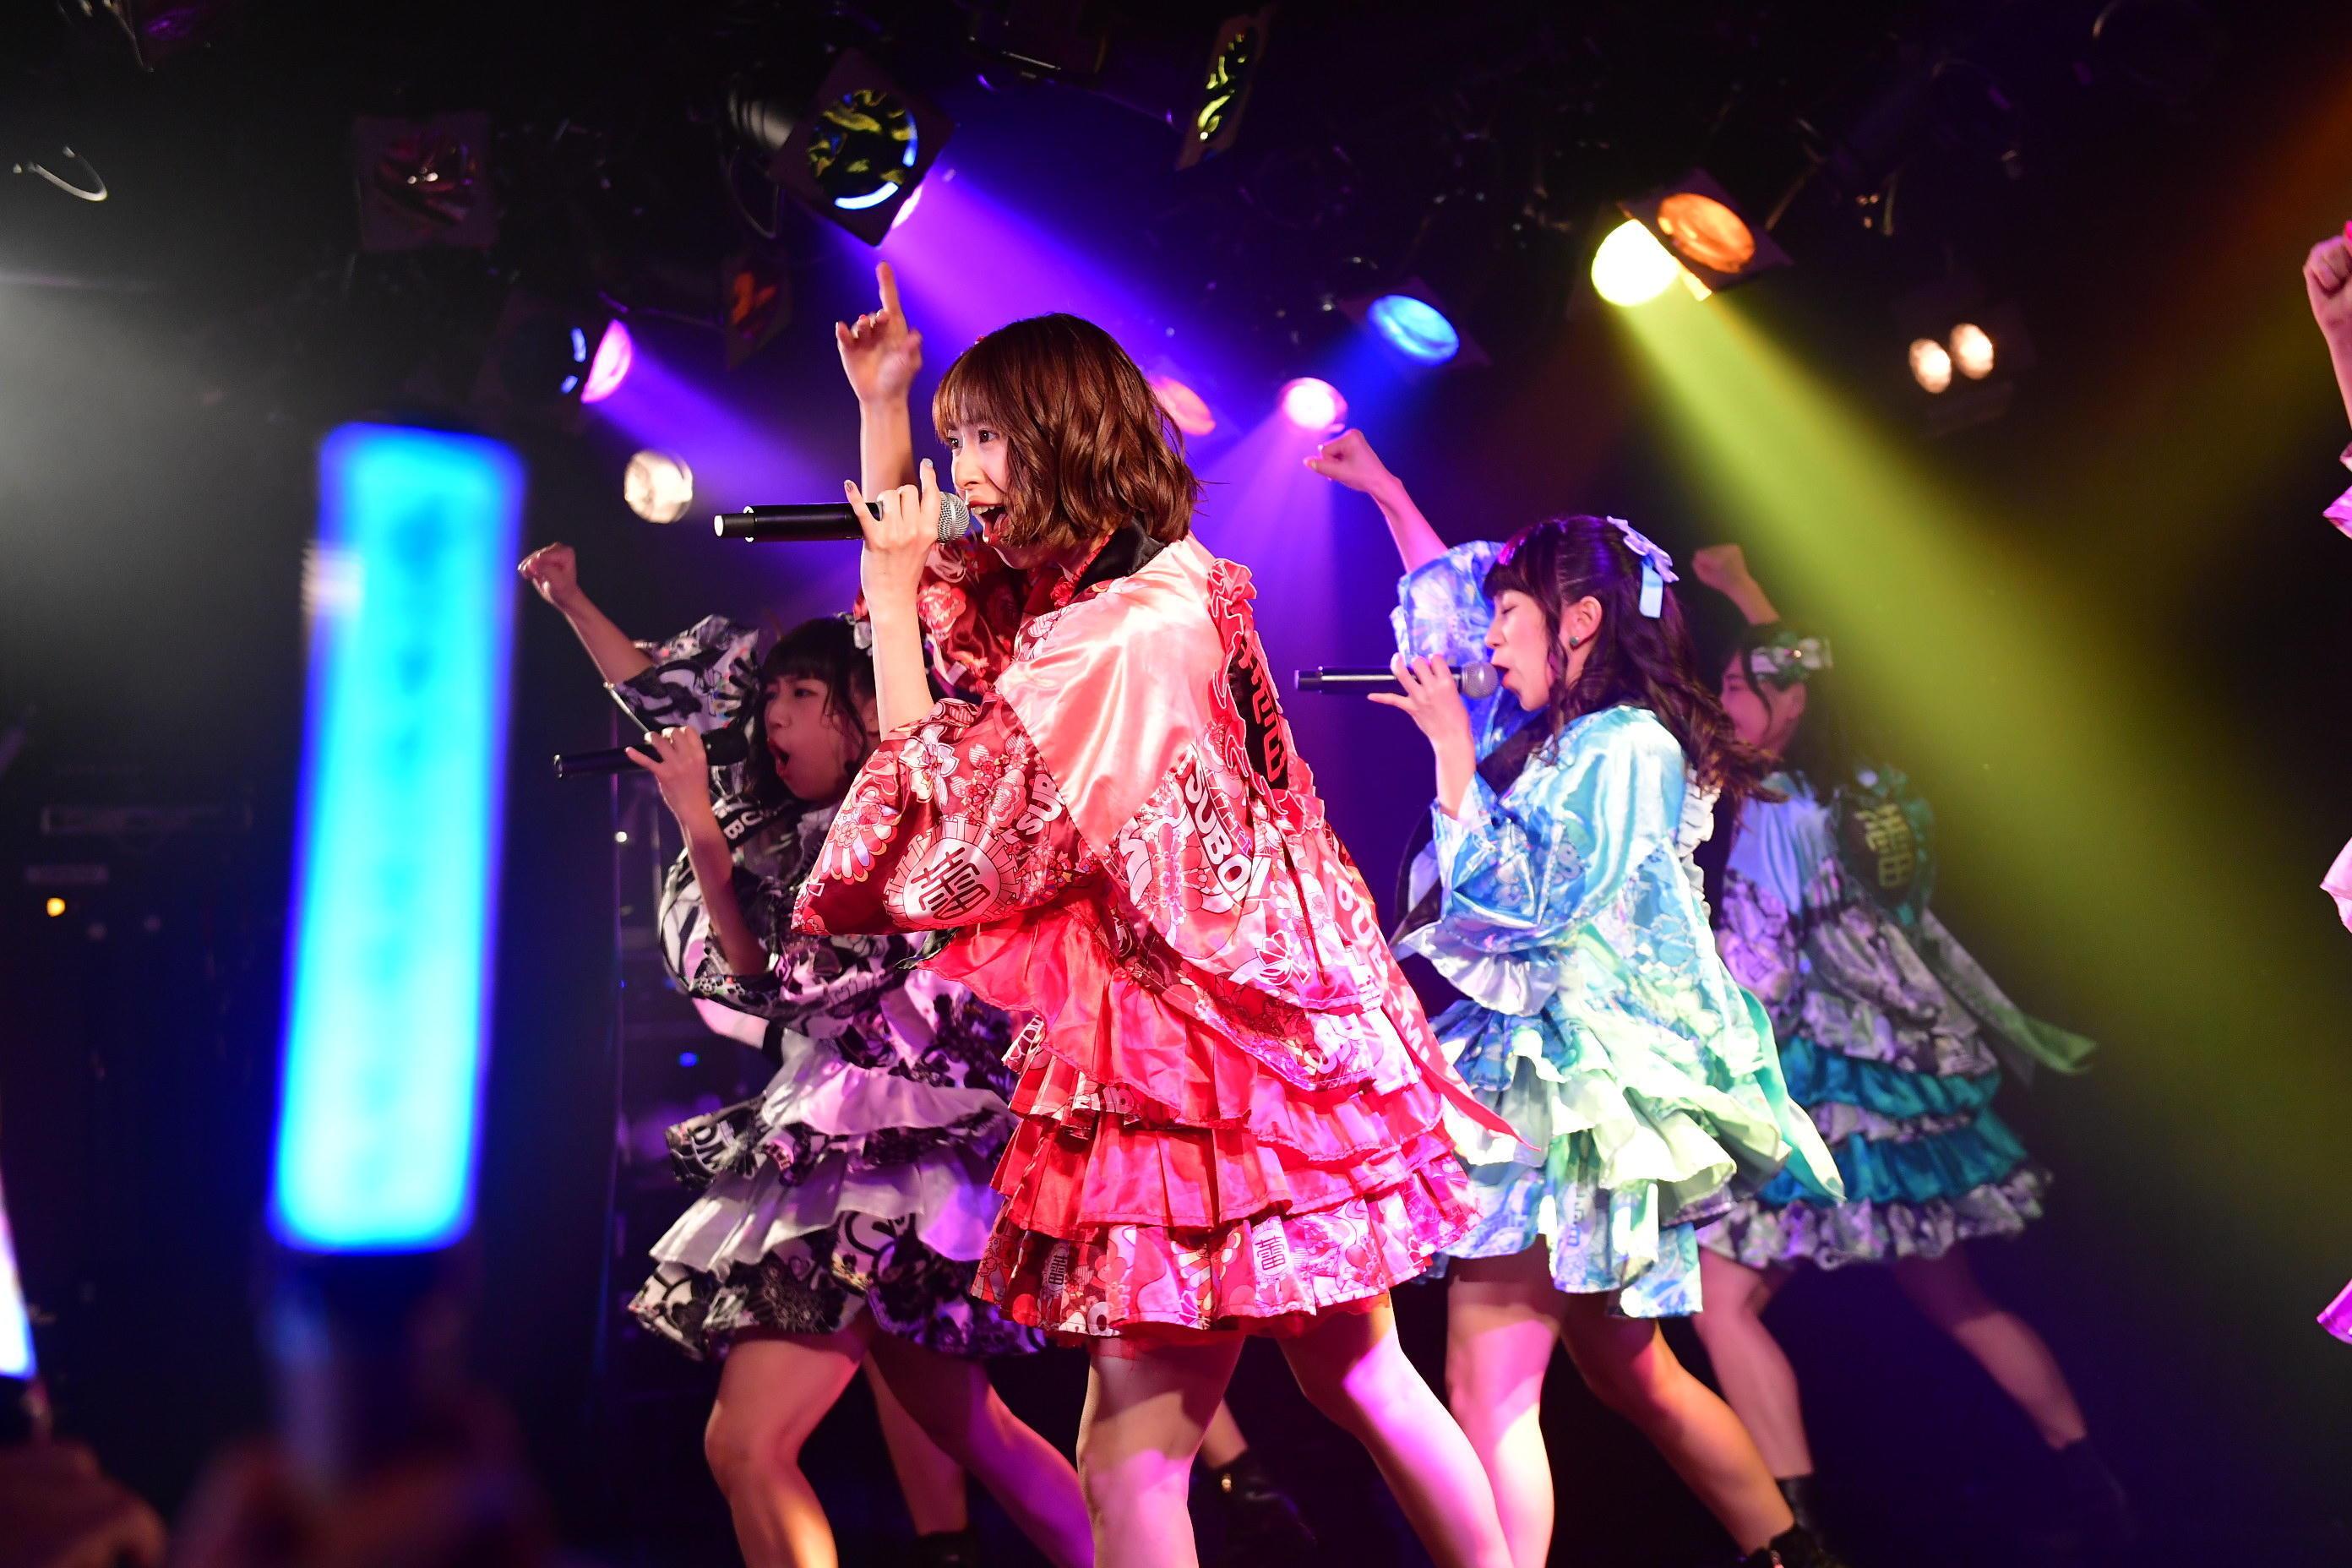 http://news.yoshimoto.co.jp/20181108182206-6e9cc54f602043f56f24af1b03caf2c6703c9f9a.jpg